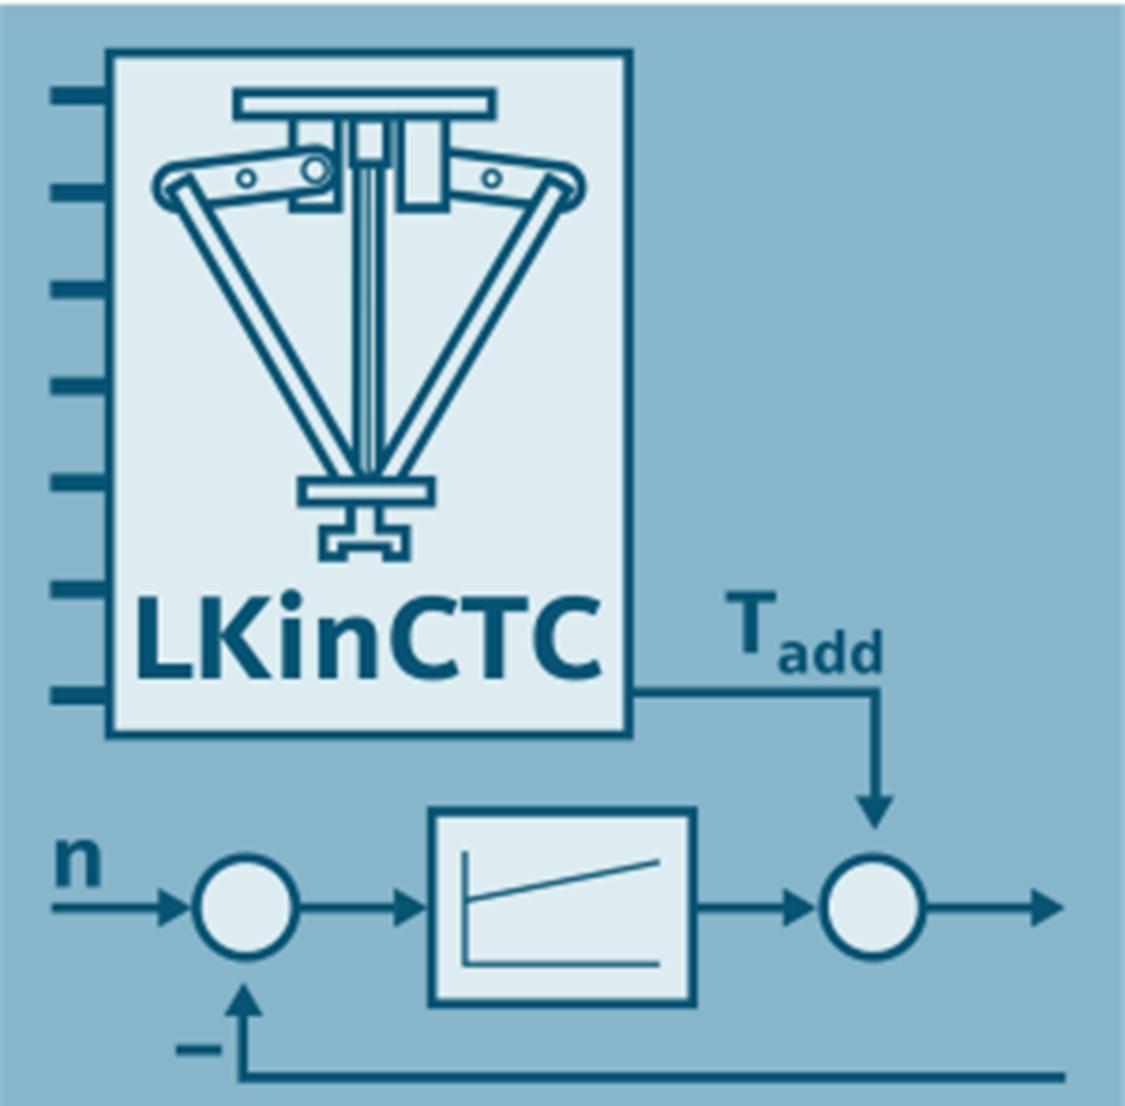 LKinCTC